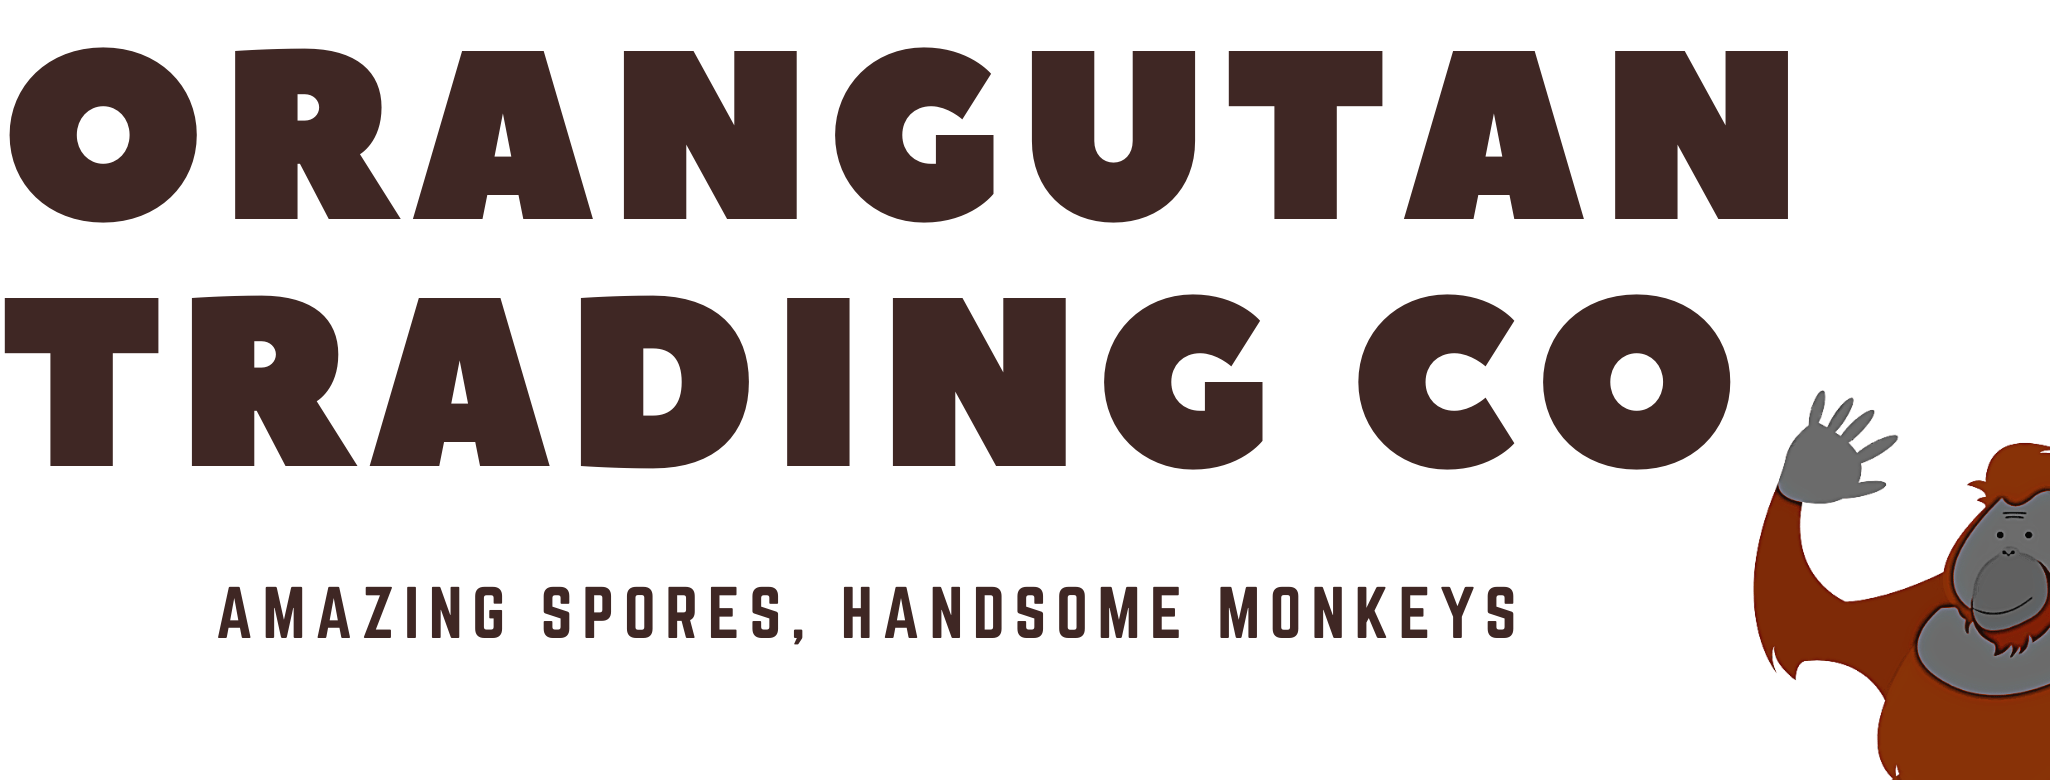 Orangutan Trading Co